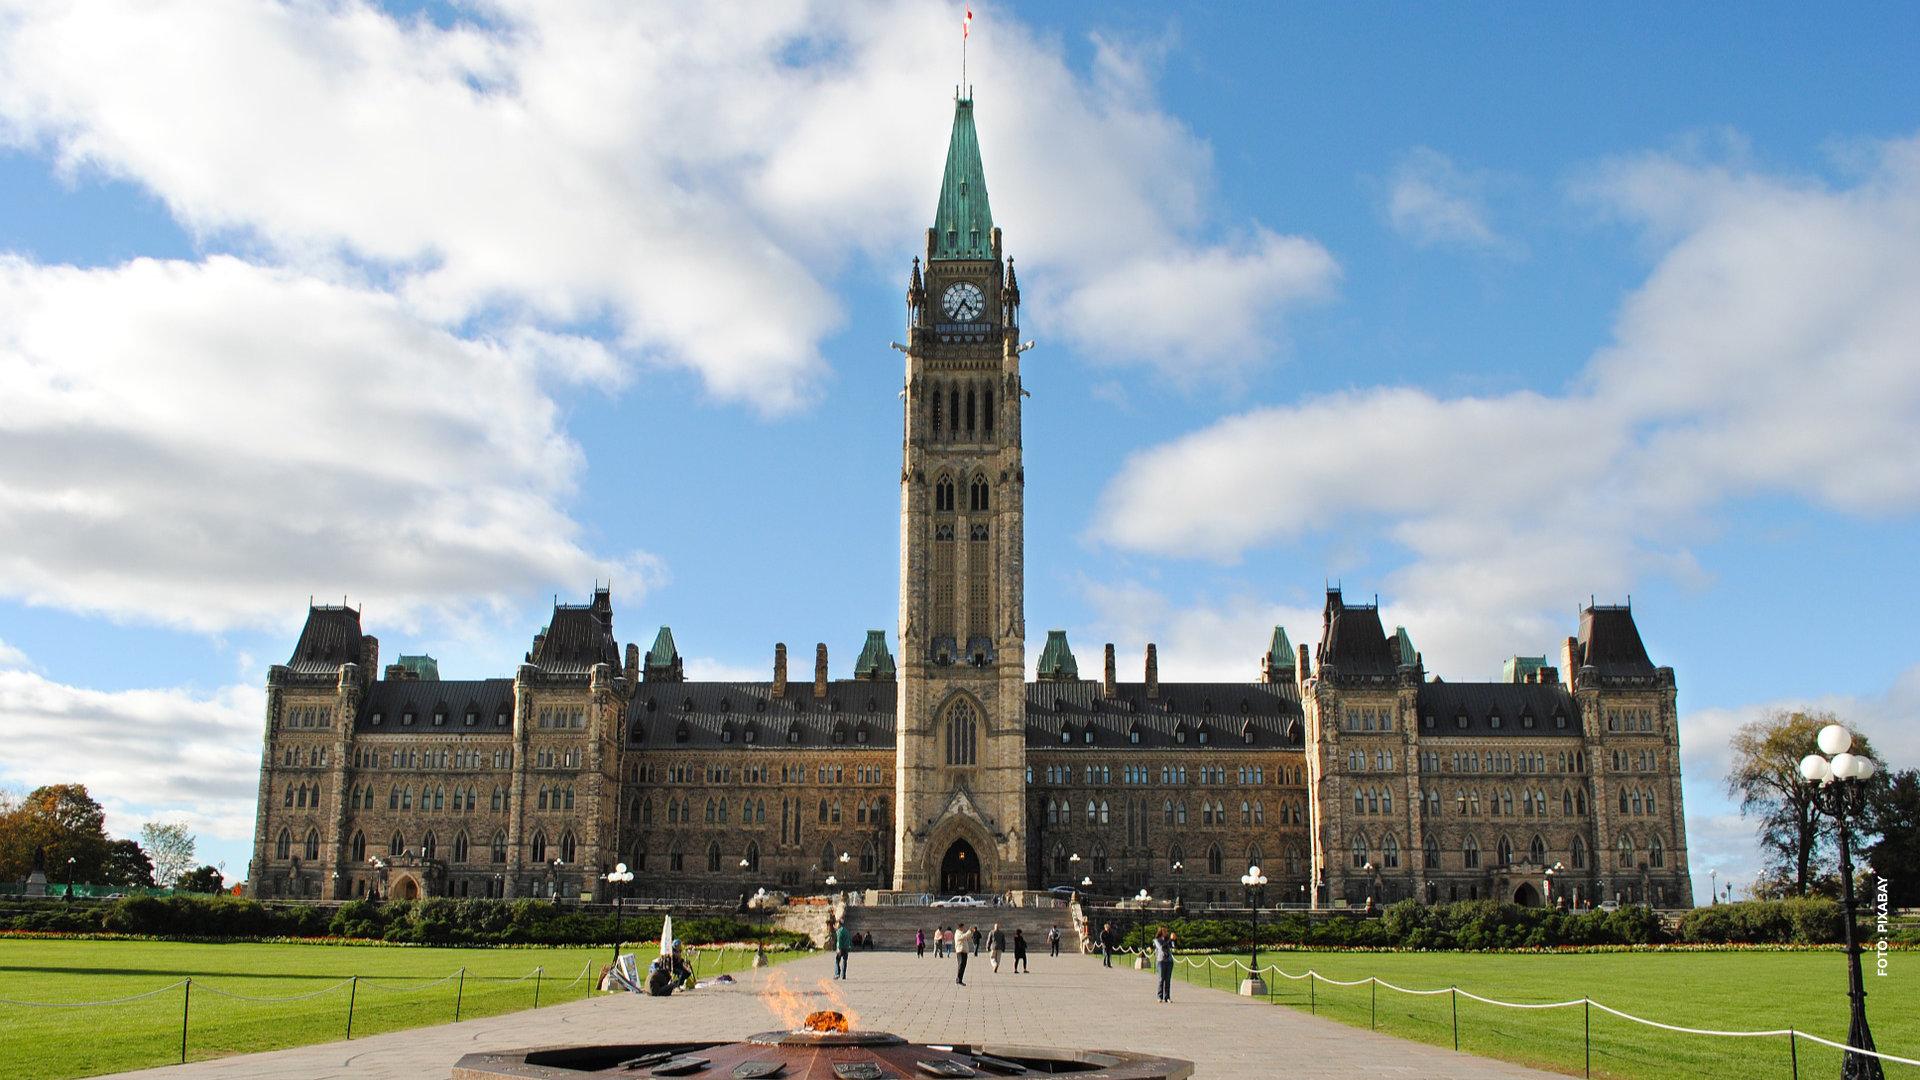 Neodemócratas salvan a gobierno de Trudeau